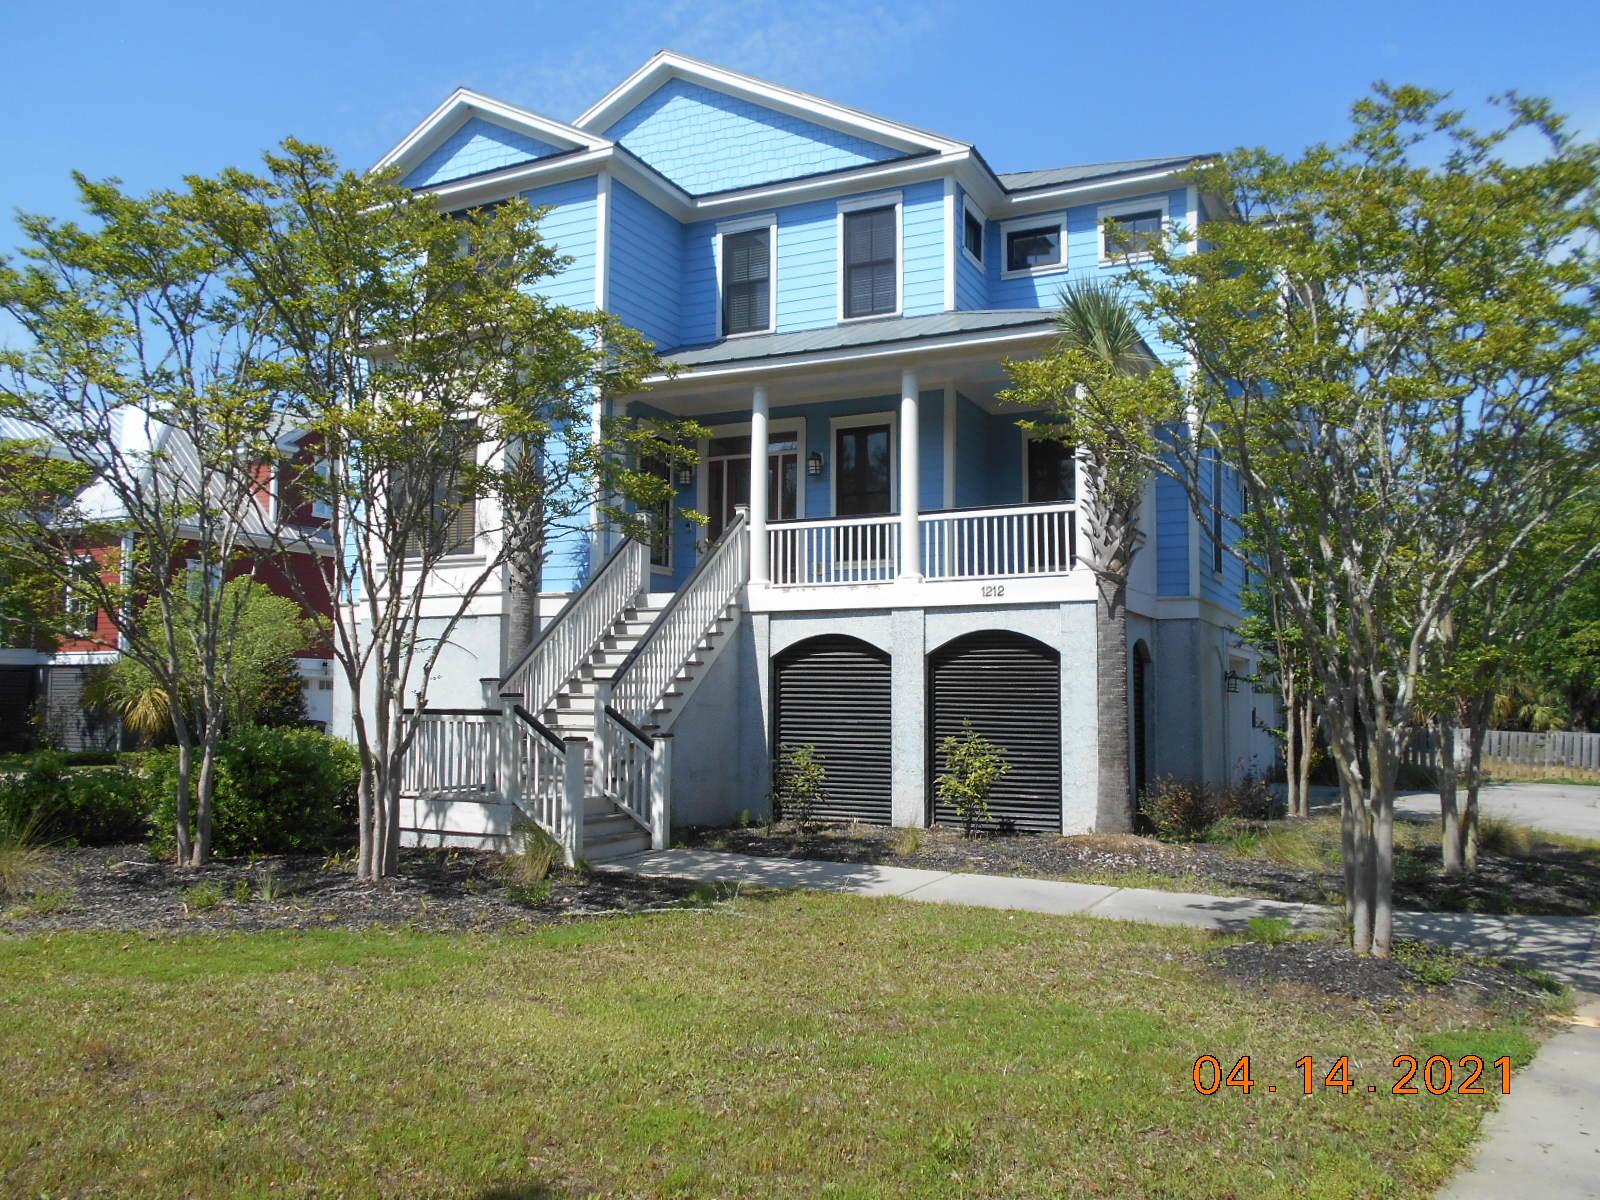 Beresford Creek Landing Homes For Sale - 1212 Winding Creek, Charleston, SC - 2